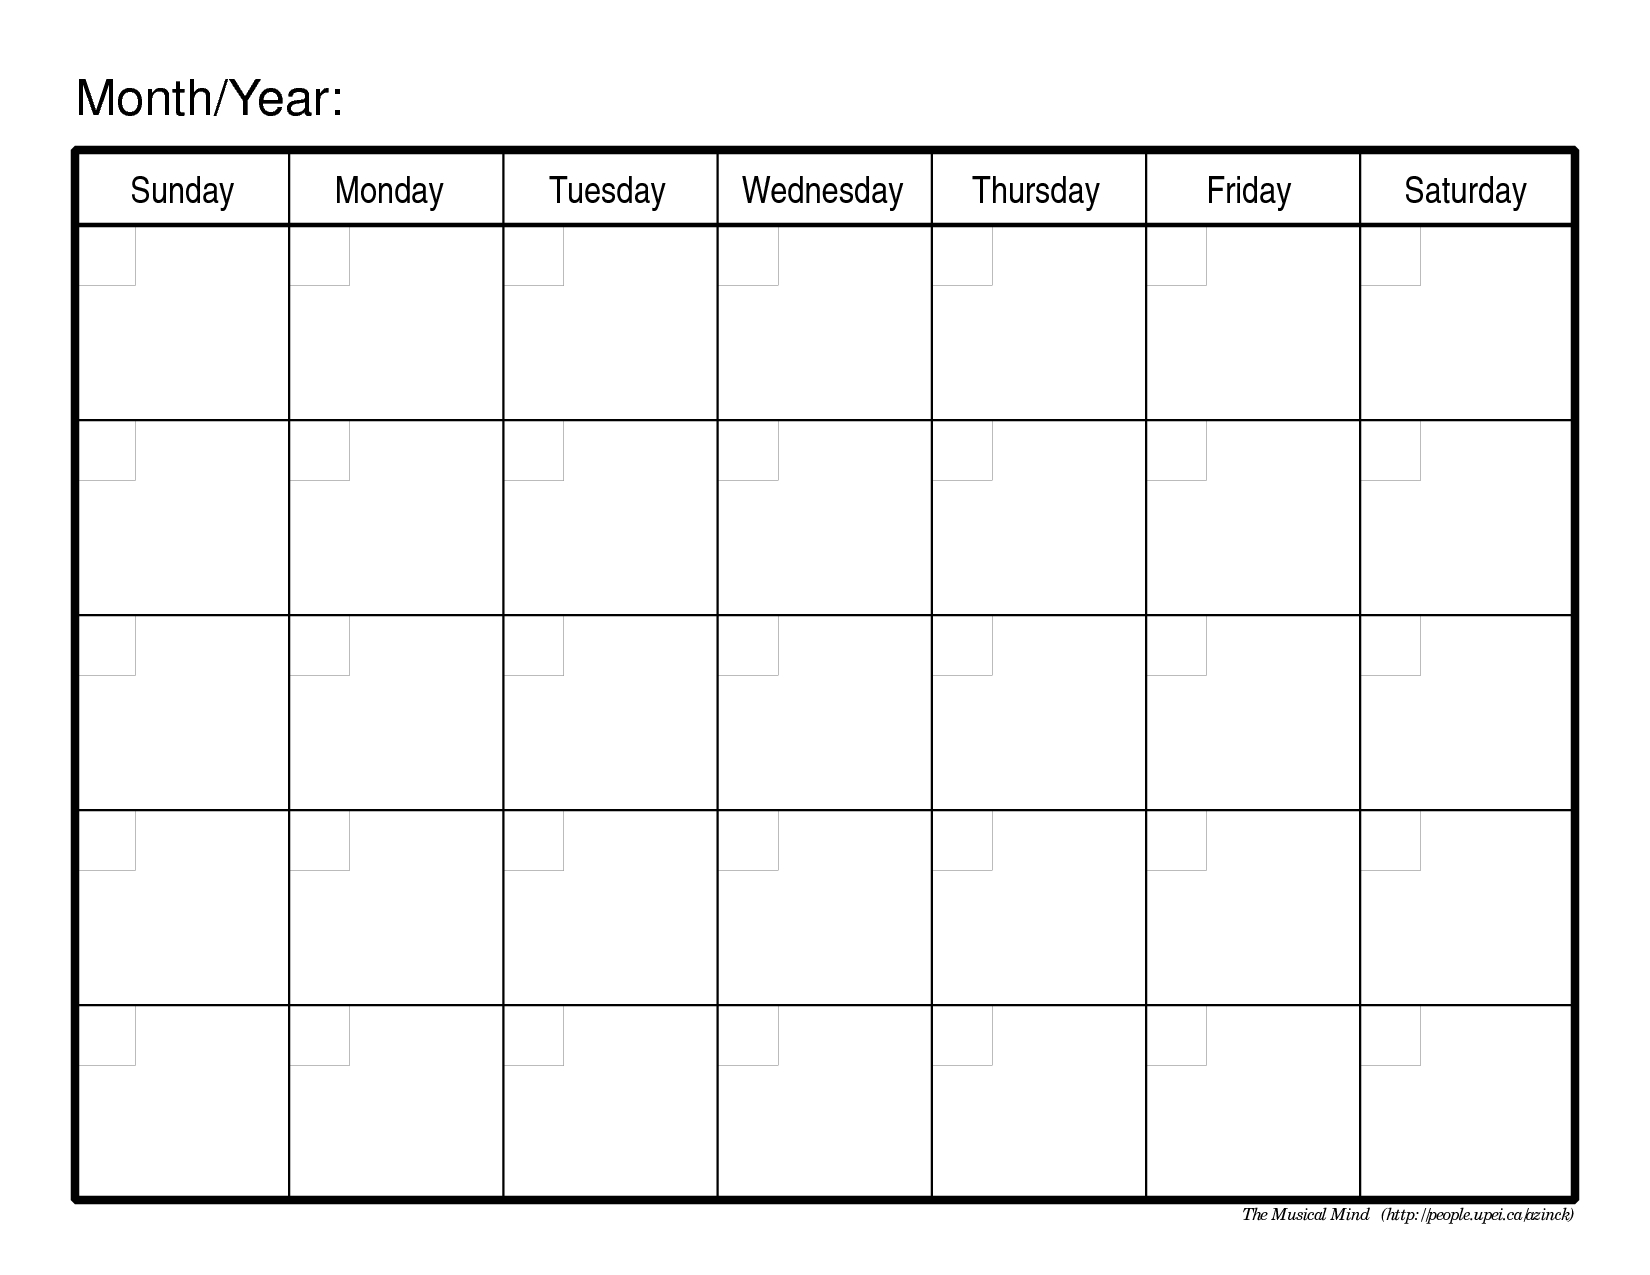 Monthly Calendar Template   Weekly Calendar Template, Free  Blank Calendar Page Template Preschool